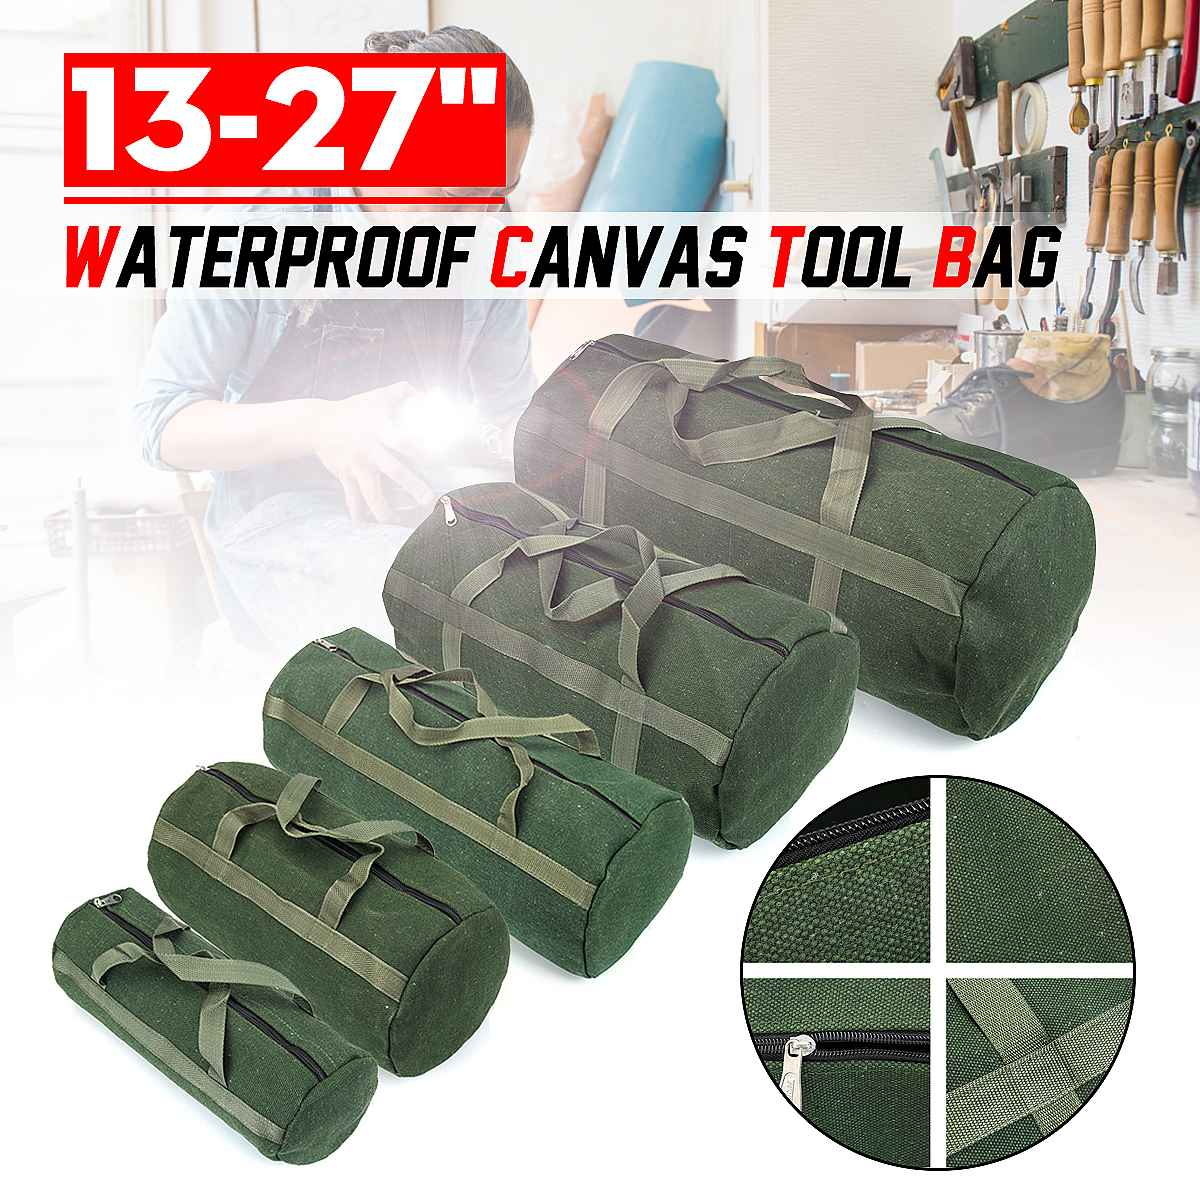 Multi-function Mechanics Tool Bag Waterproof Oxford Cloth Canvas Hand Toolbag Portable Electrician Shoulder Storage Zipper Bag